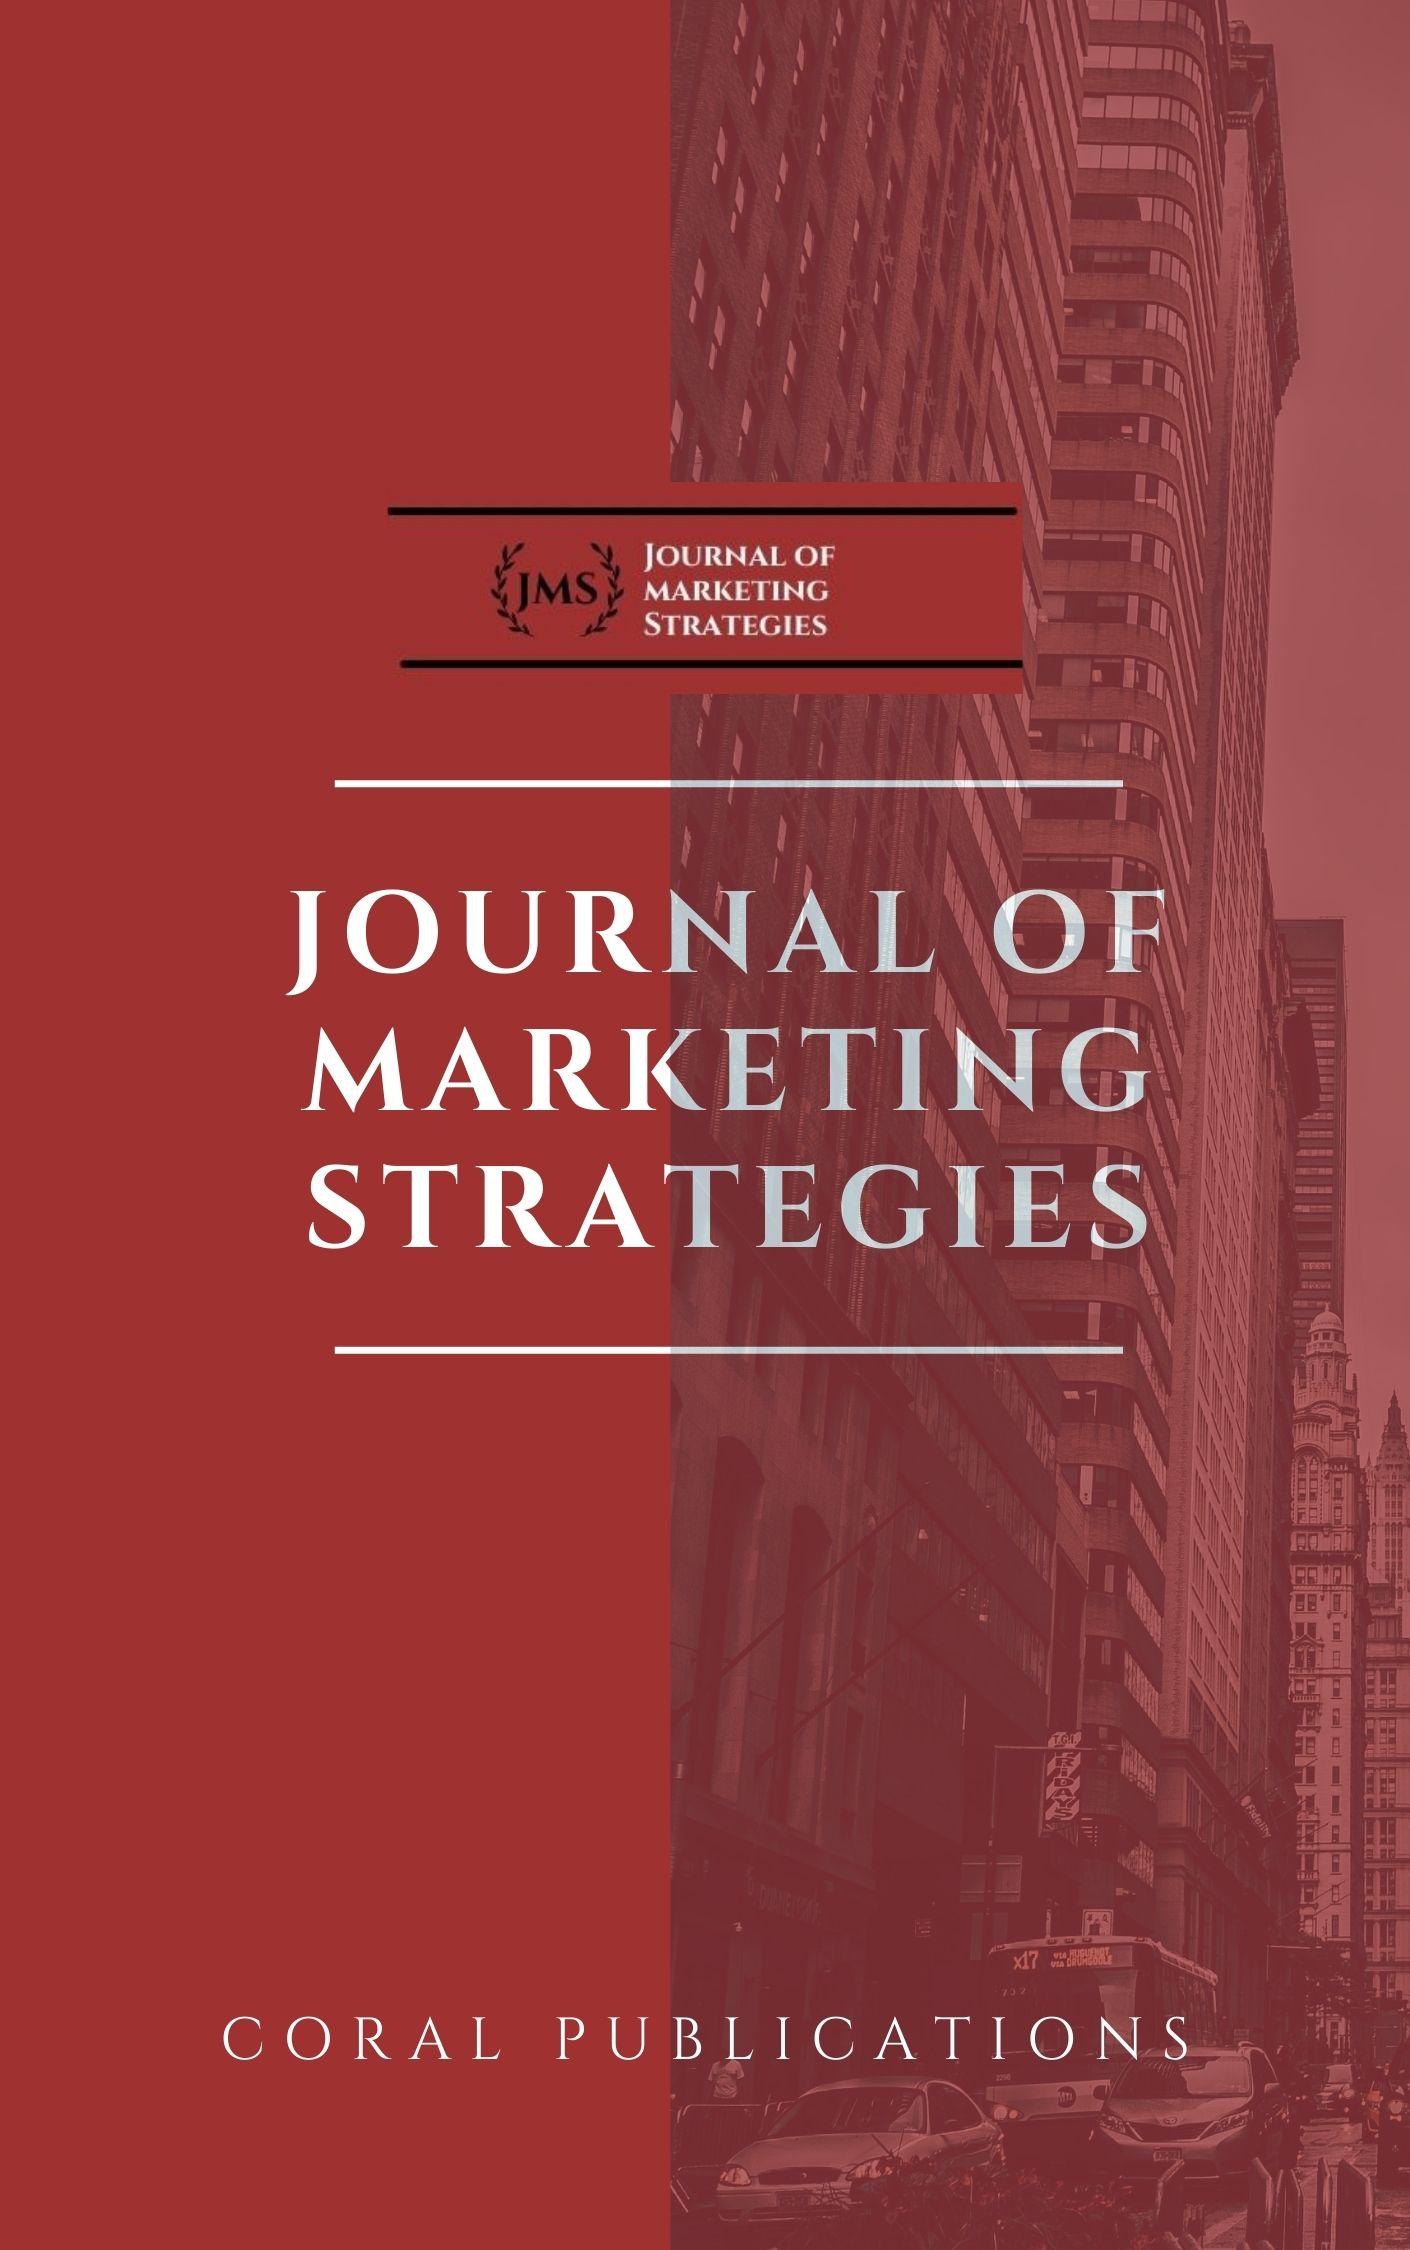 JOURNAL OF MARKETING STRATEGIES (JMS)